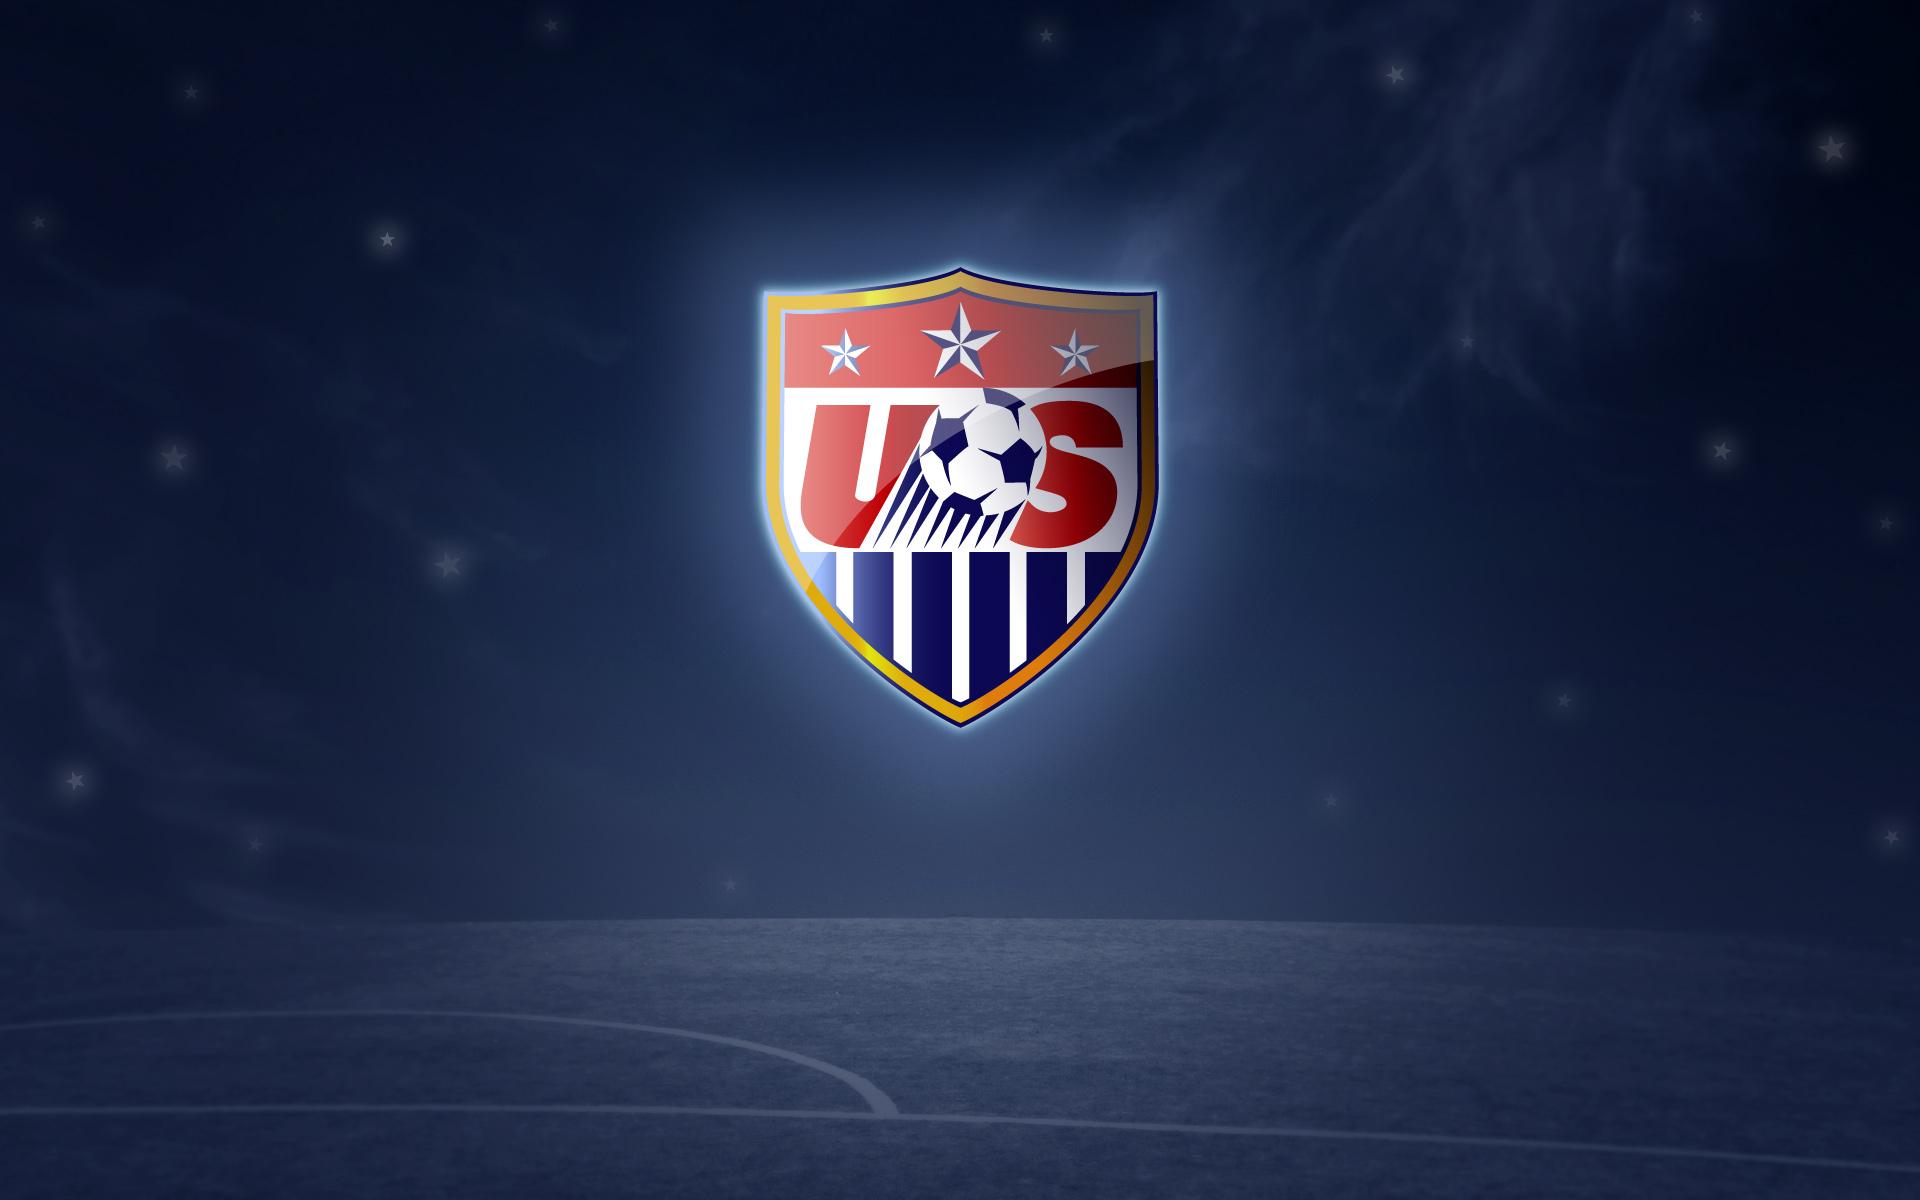 United States Wallpaper 1920x1200 United States Soccer Team 1920x1200